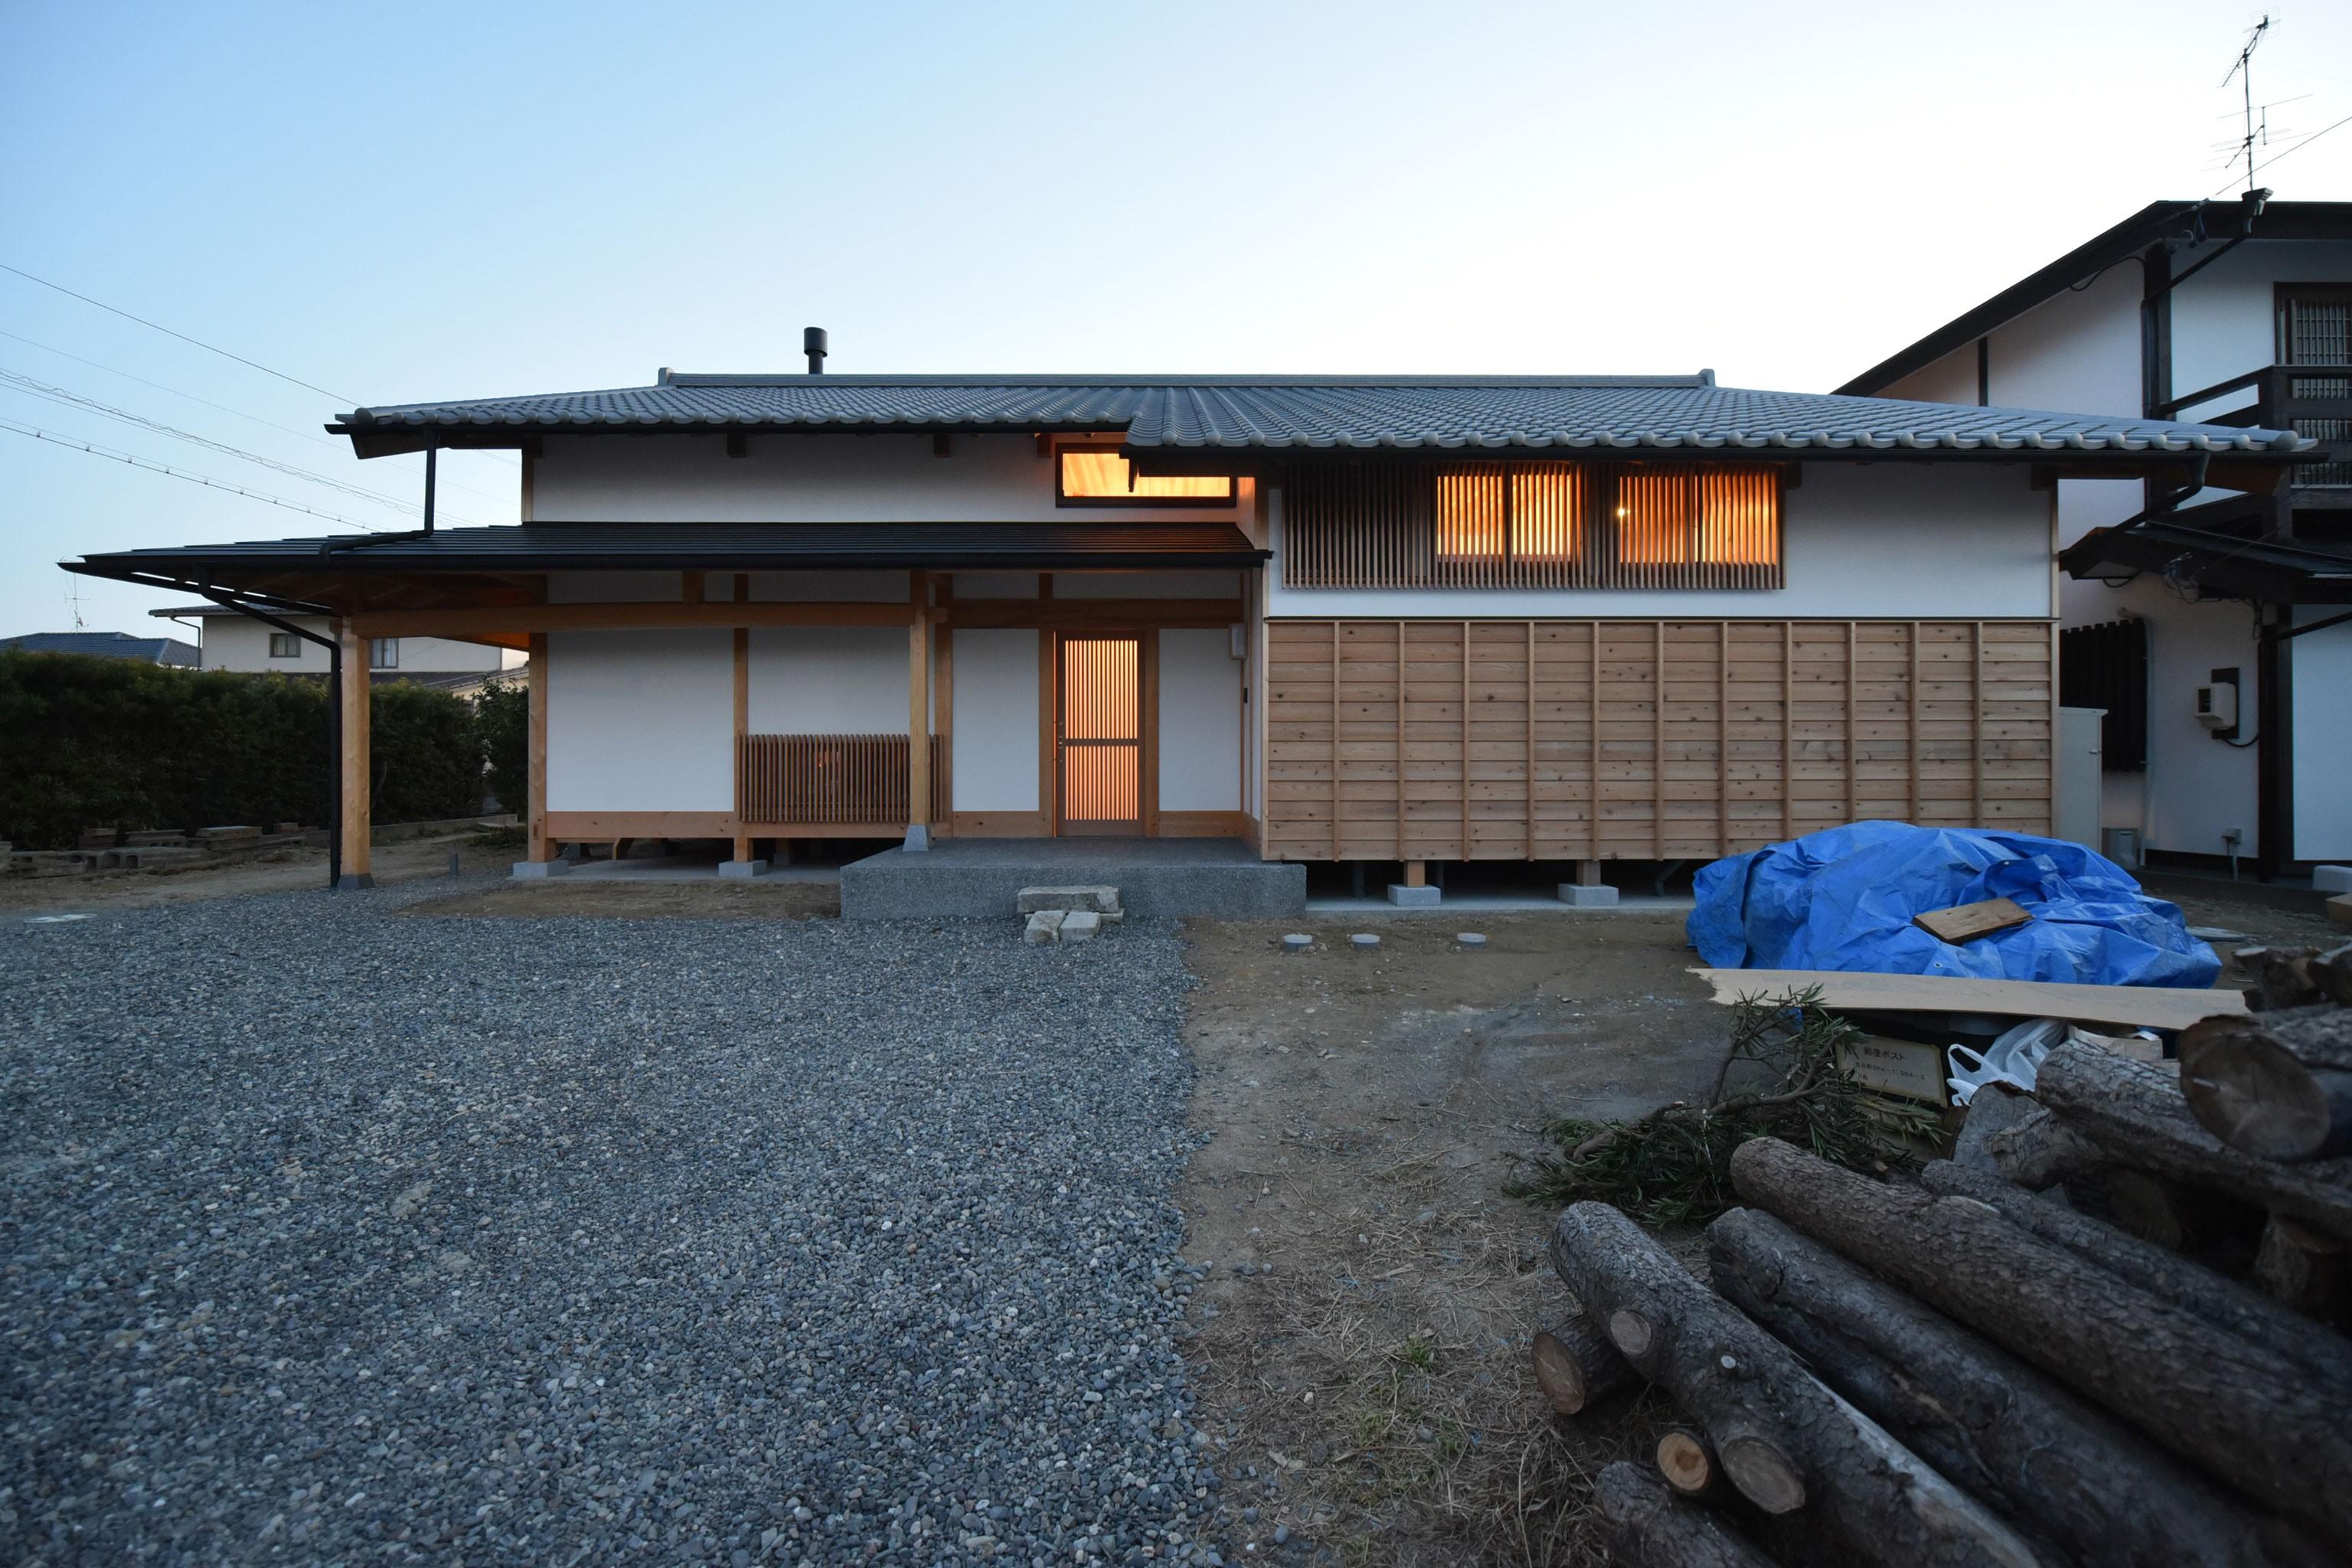 外観事例:北側玄関正面(静岡の石場建て)